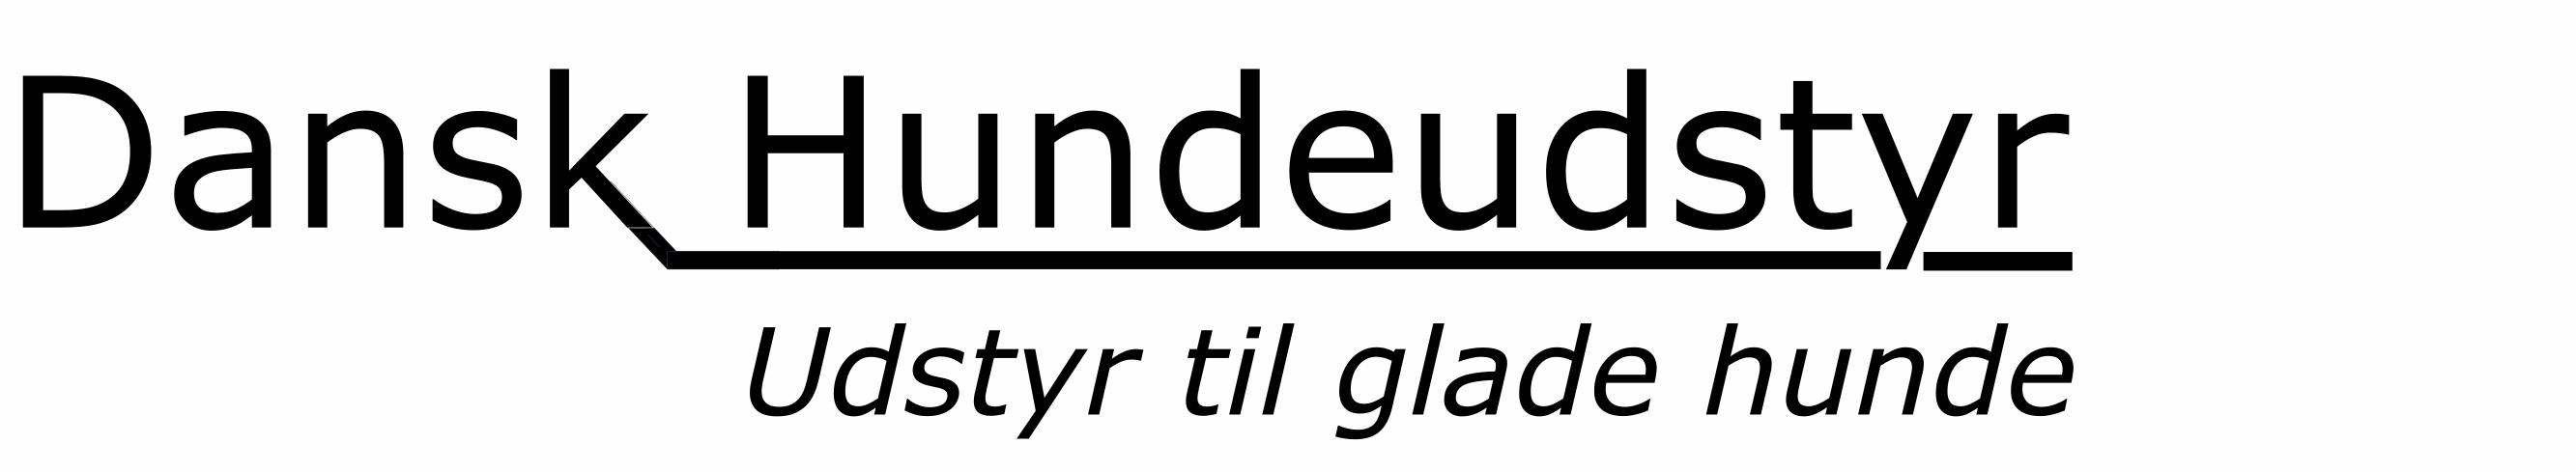 Dansk Hundeudstyr